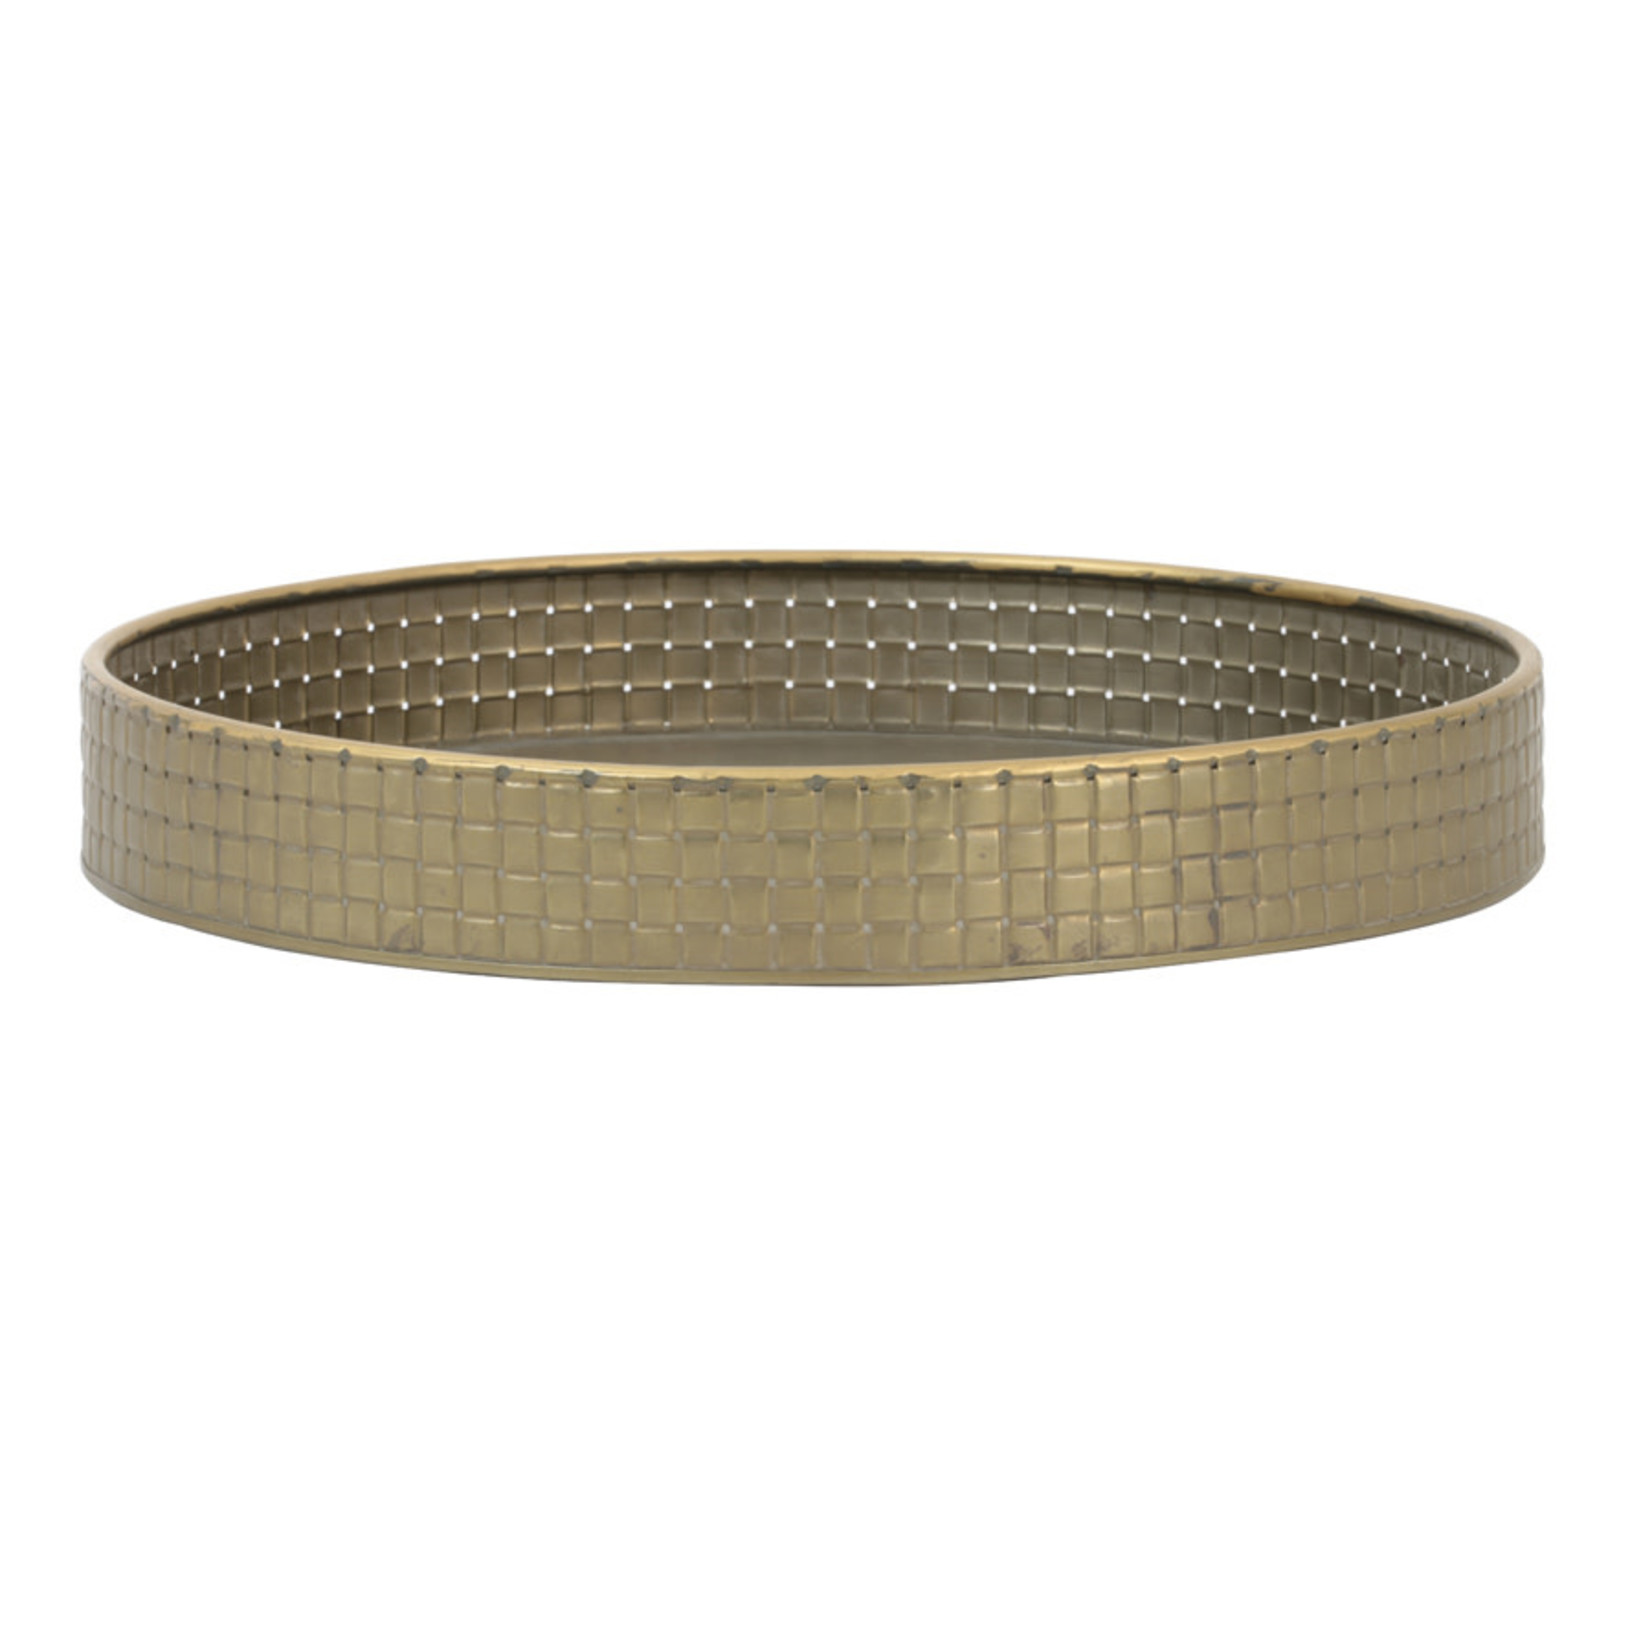 Light & Living Dienblad Ø39x8,5 cm STAVO tin brons